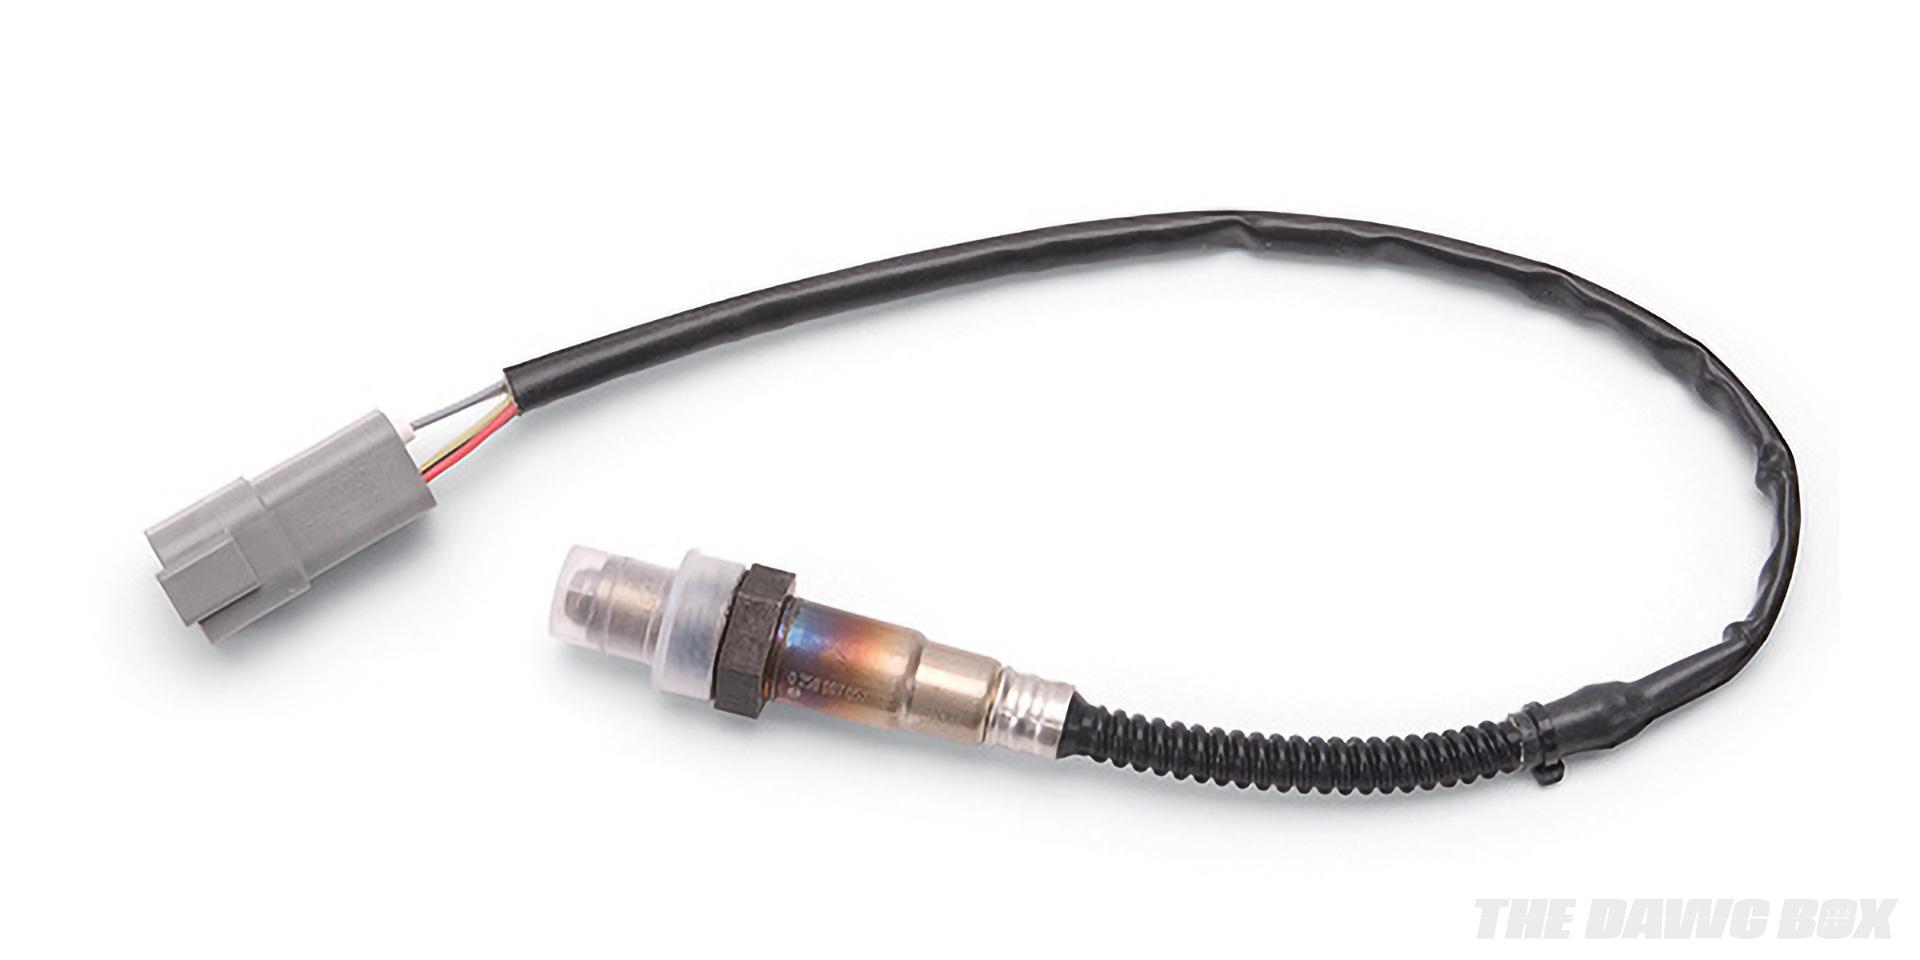 Oxygen Sensor for an EFI system